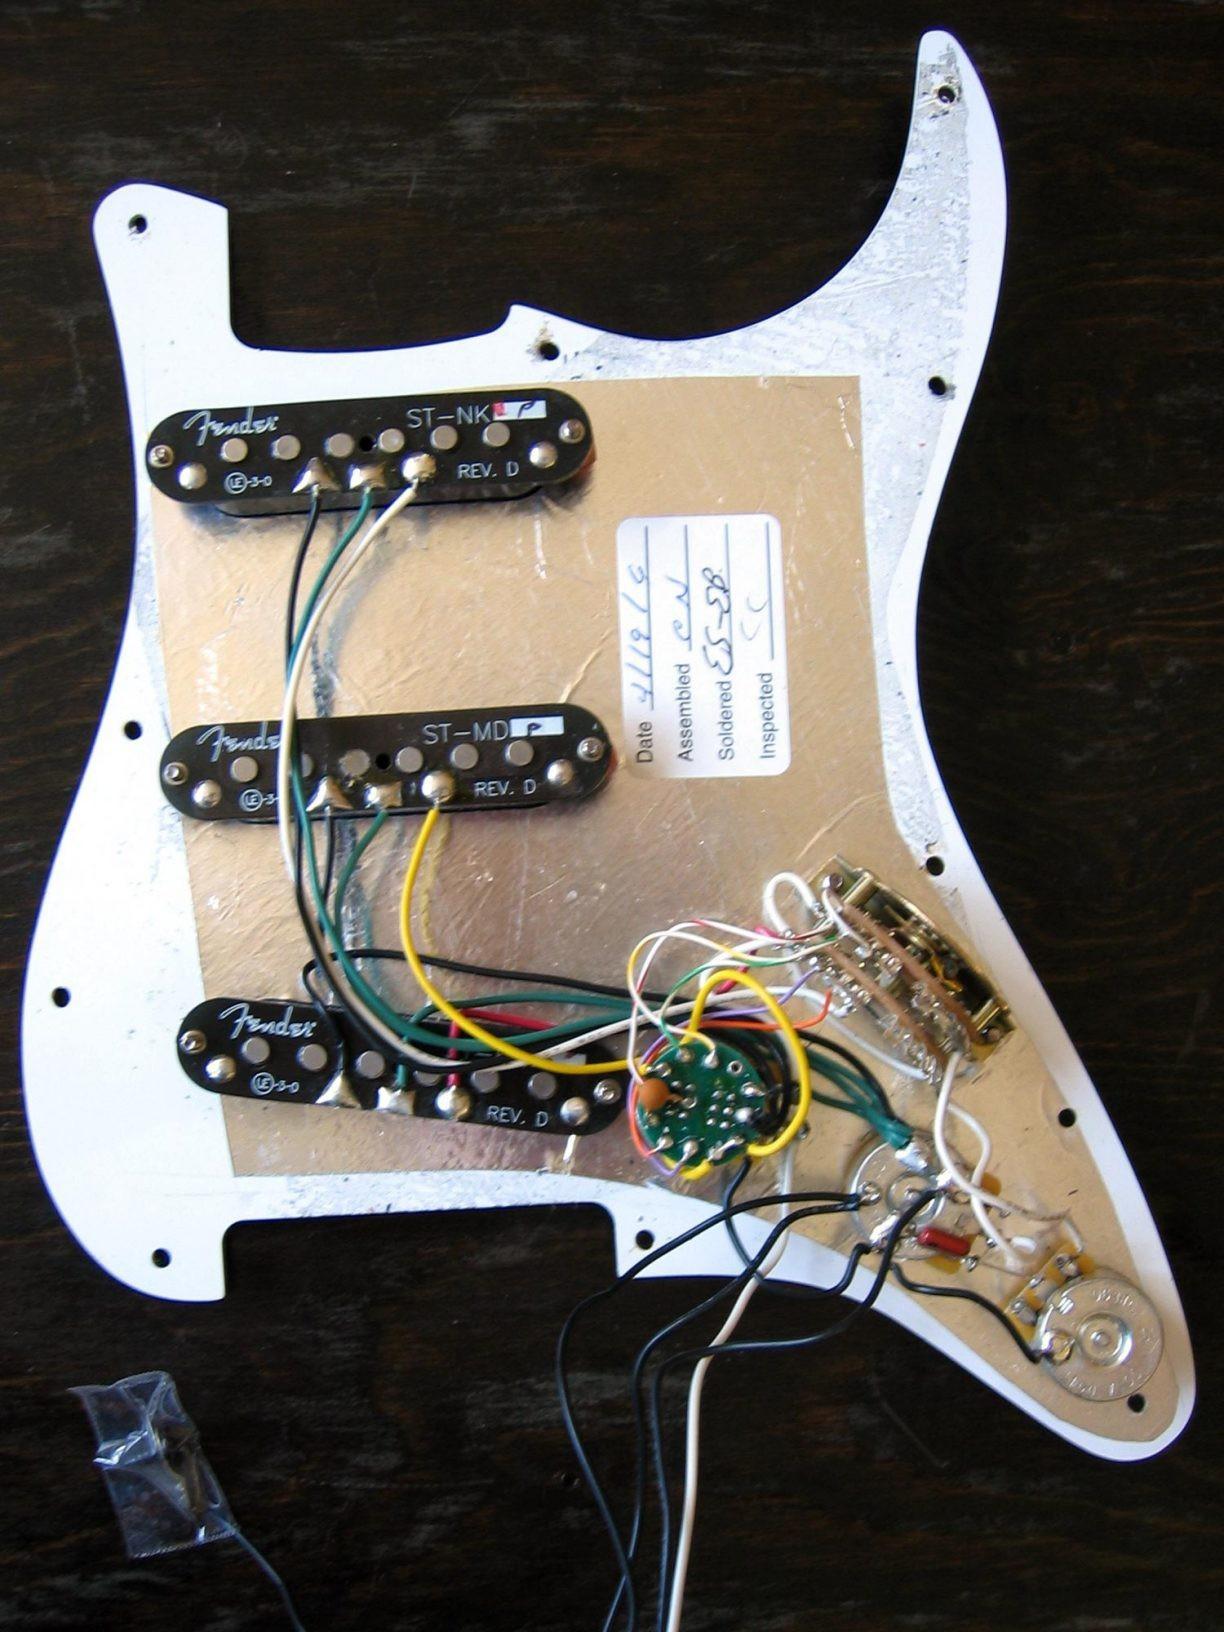 Wiring Diagram Stratocaster Guitar Inspirationa Wiring Diagram Guitar Fender Save Fender Wiring Diagram Guitar